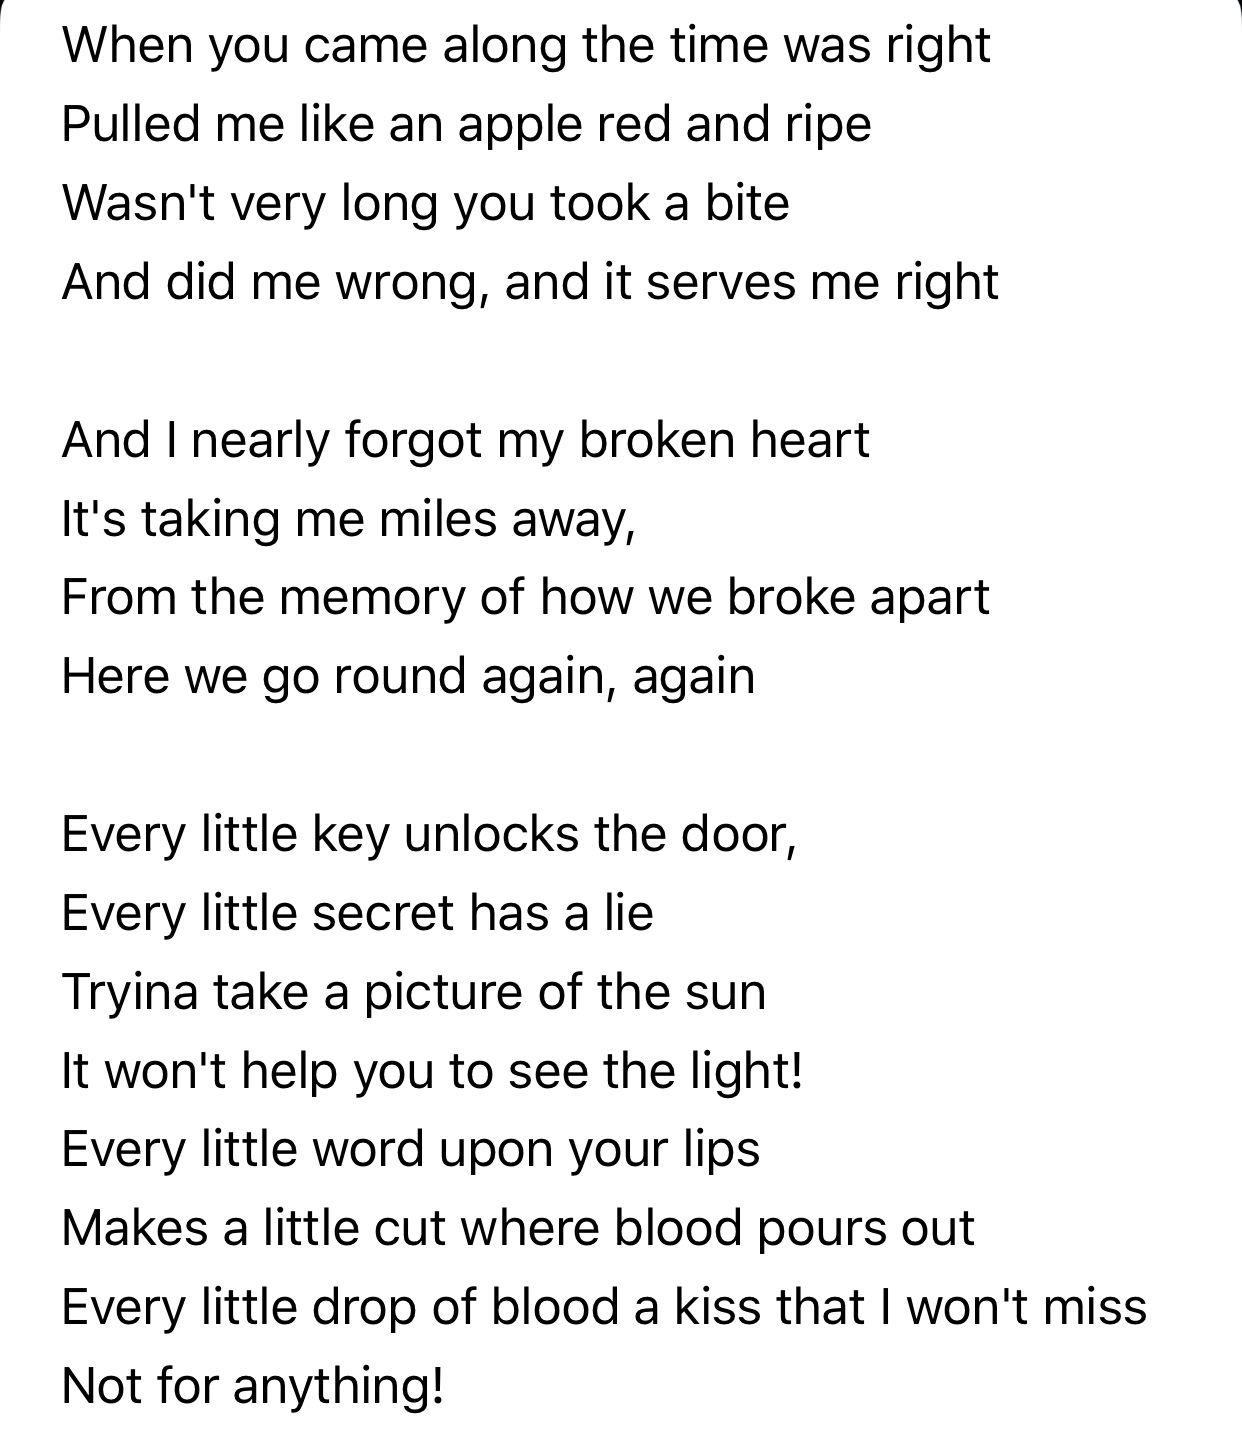 Nearly Forgot My Broken Heart Chris Cornell Lyrics To Live By